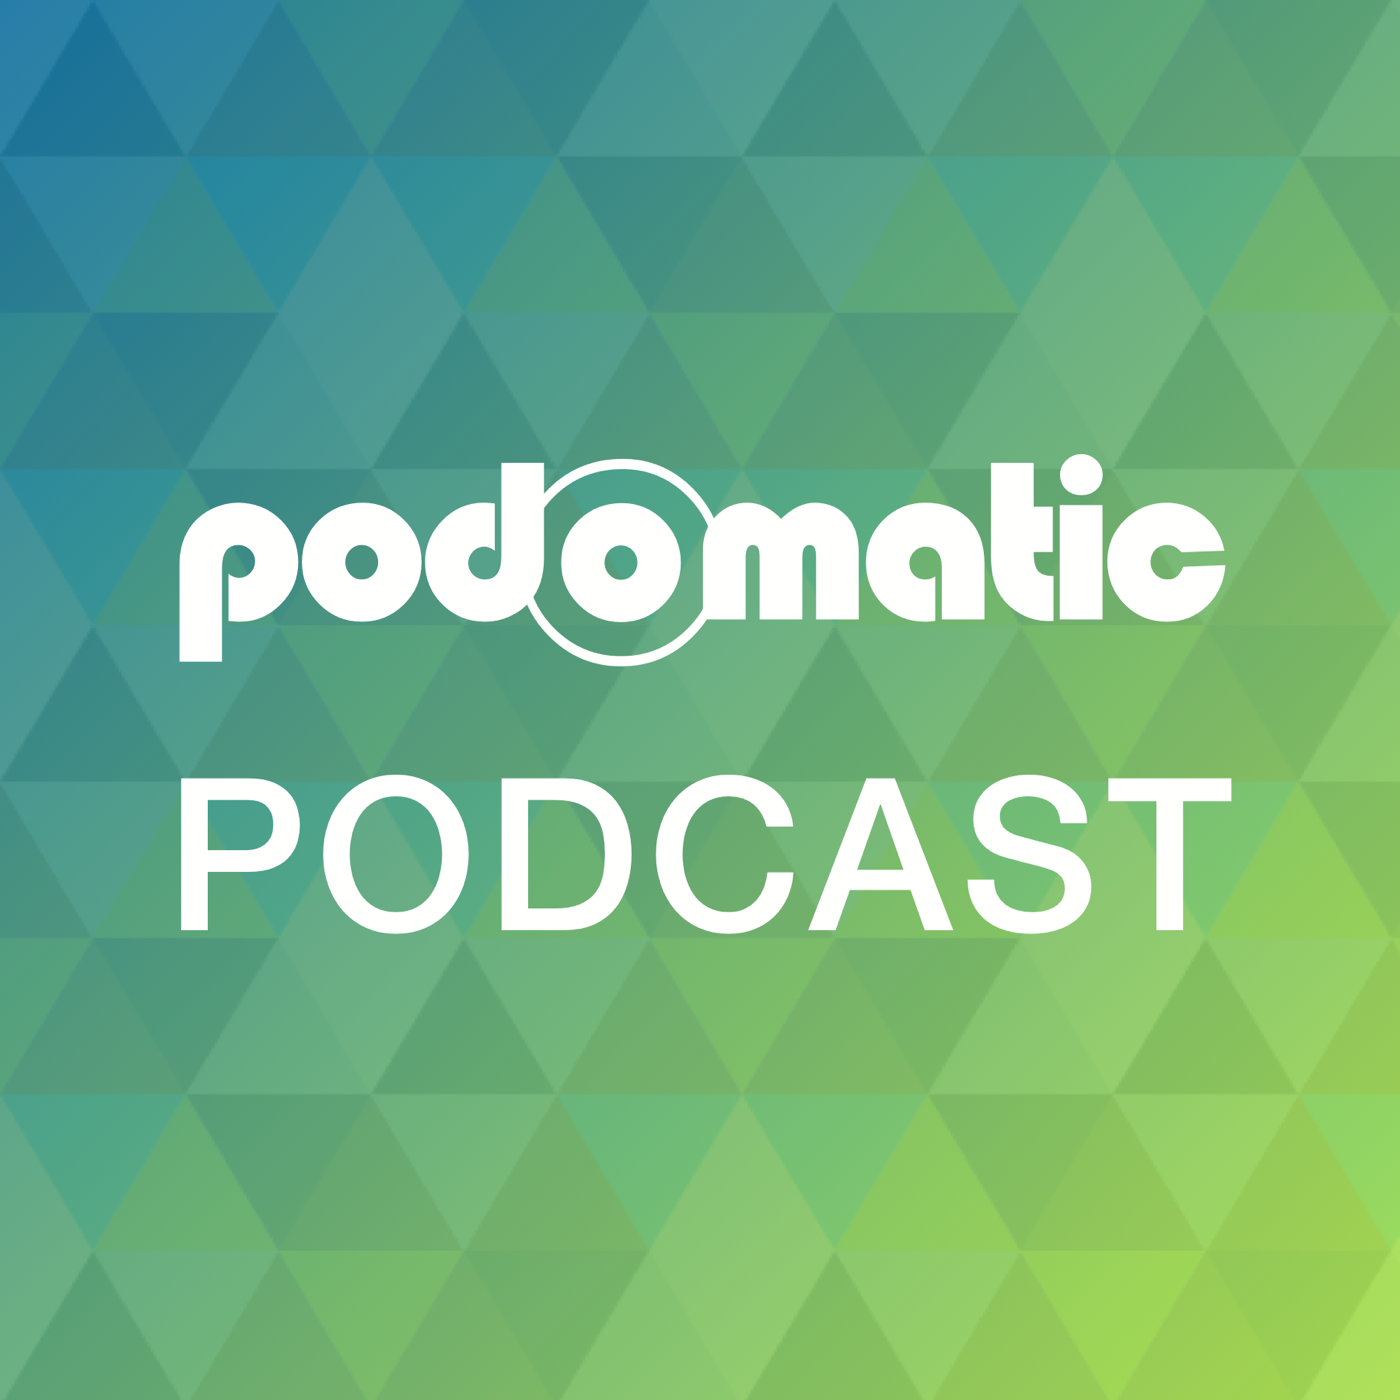 Marco Antonio Luna's Podcast